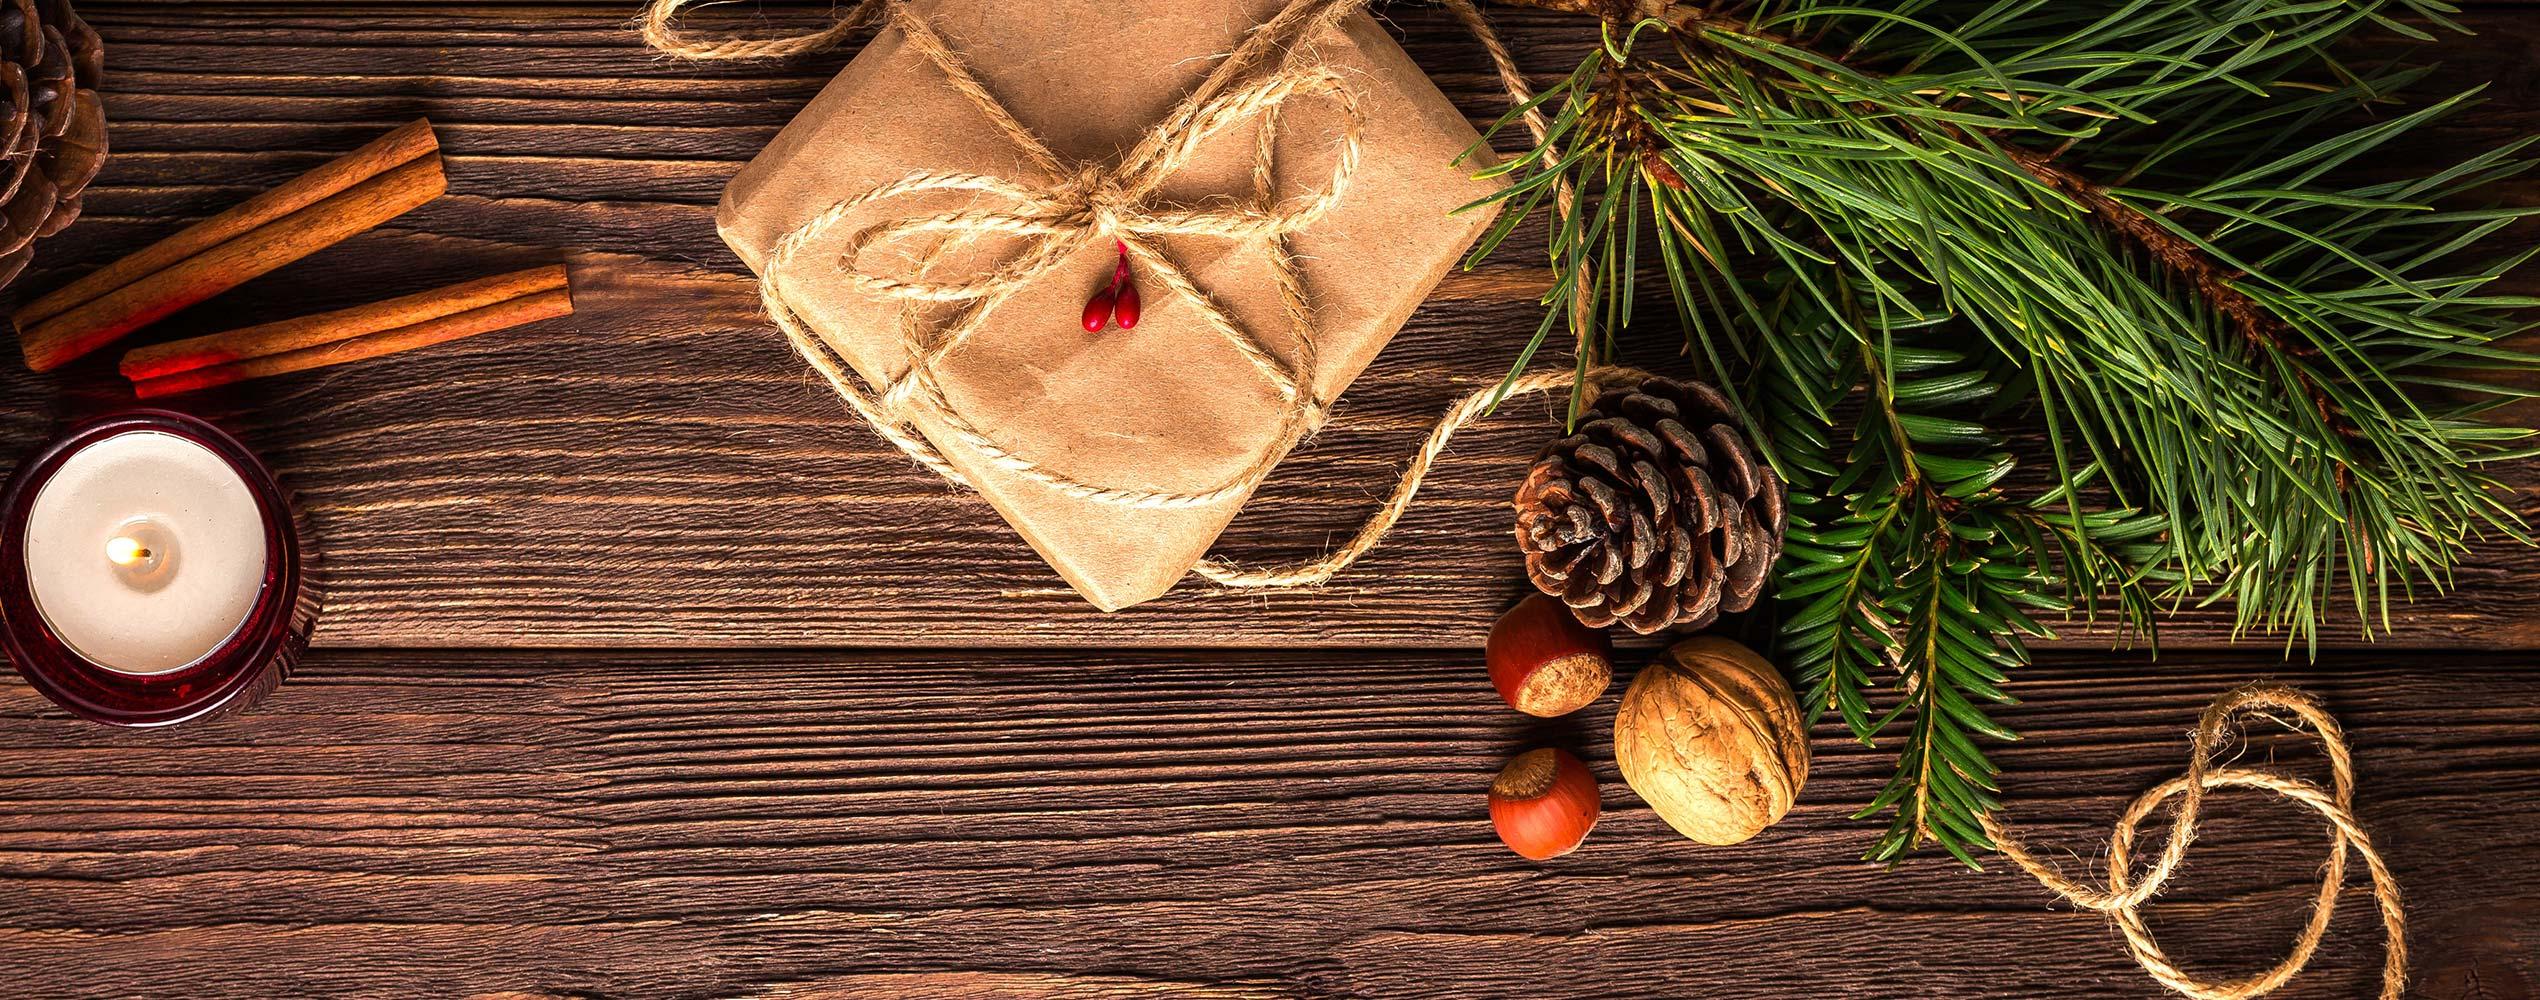 pixabay Daria-Yakovleva Weihnachten